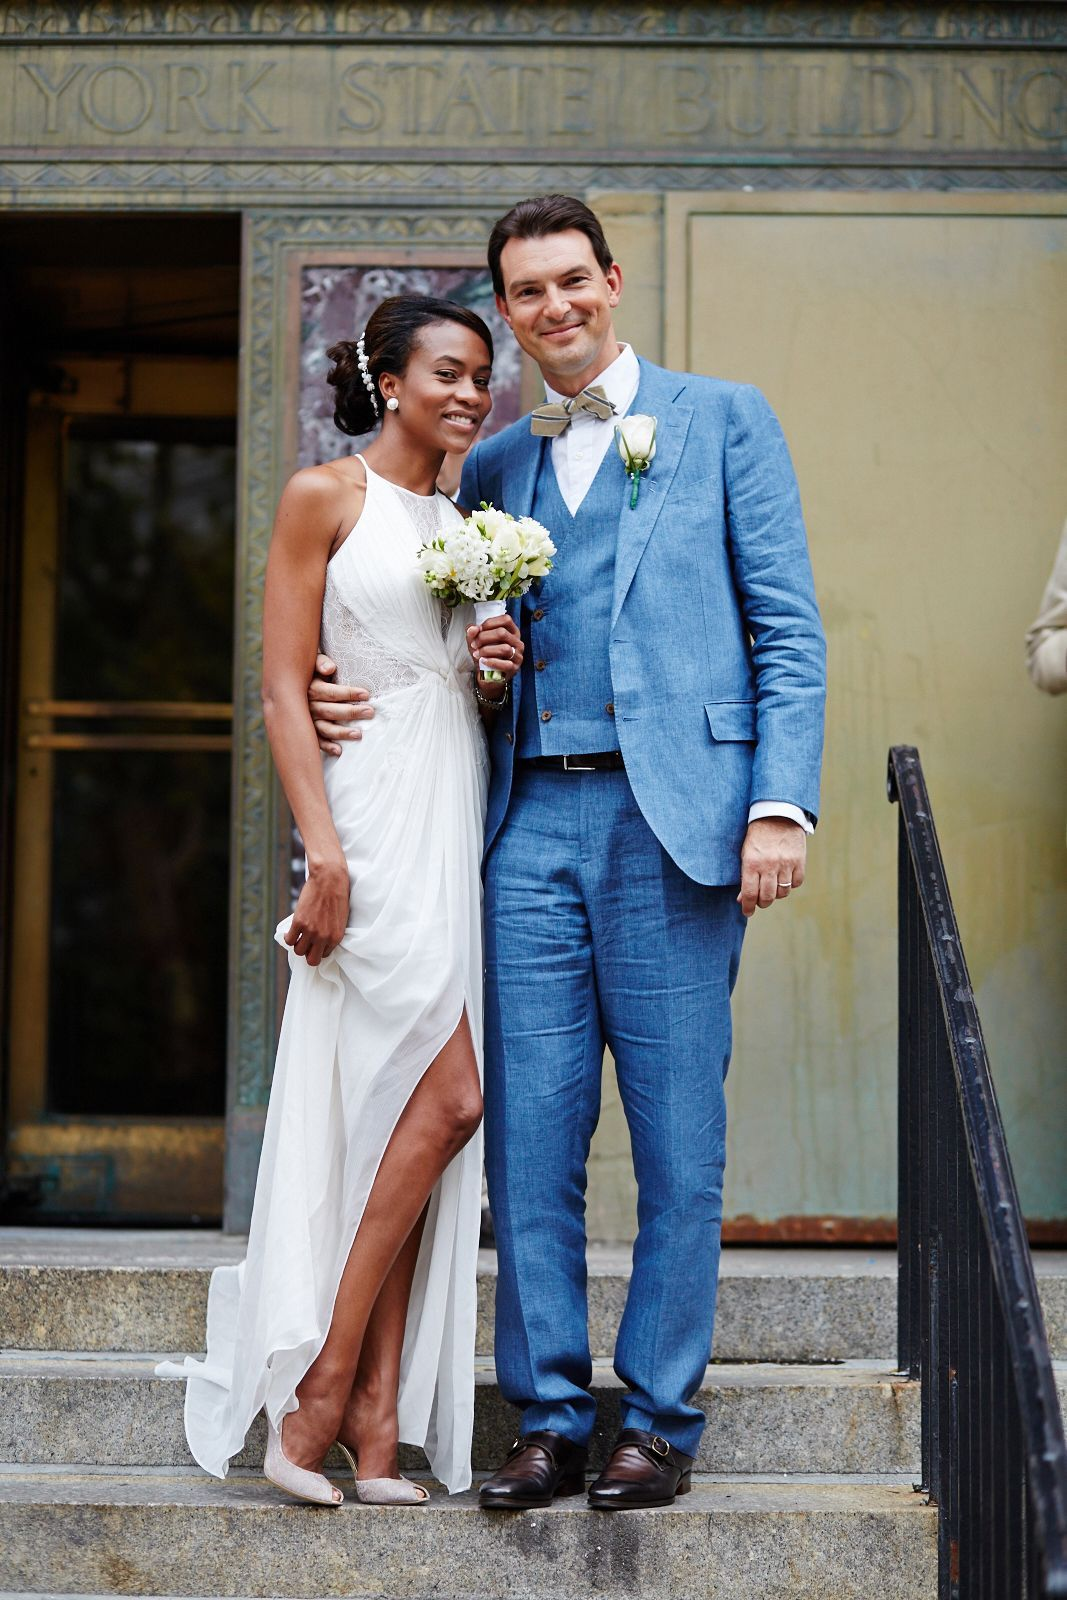 Wedding Style - City Hall New York | City hall weddings, Couples and ...